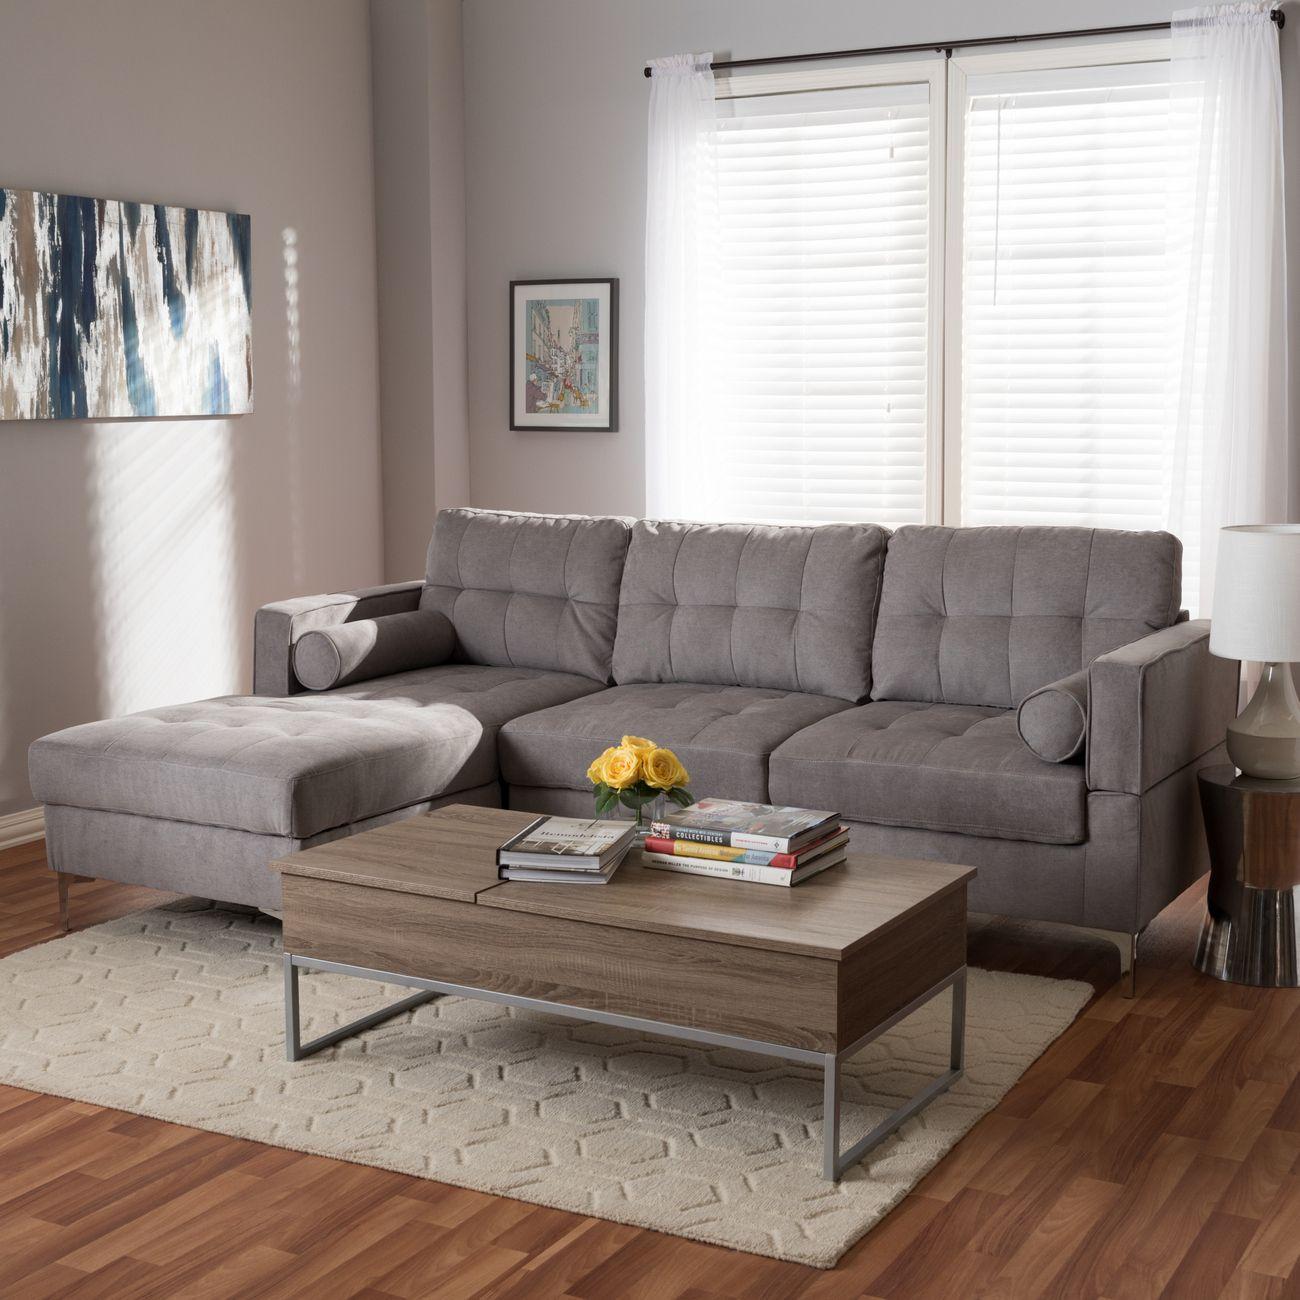 Baxton Studio Mireille Modern Contemporary Light Grey Fabric Upholstered Sectional Sofa R7860 Light Gray Lfc